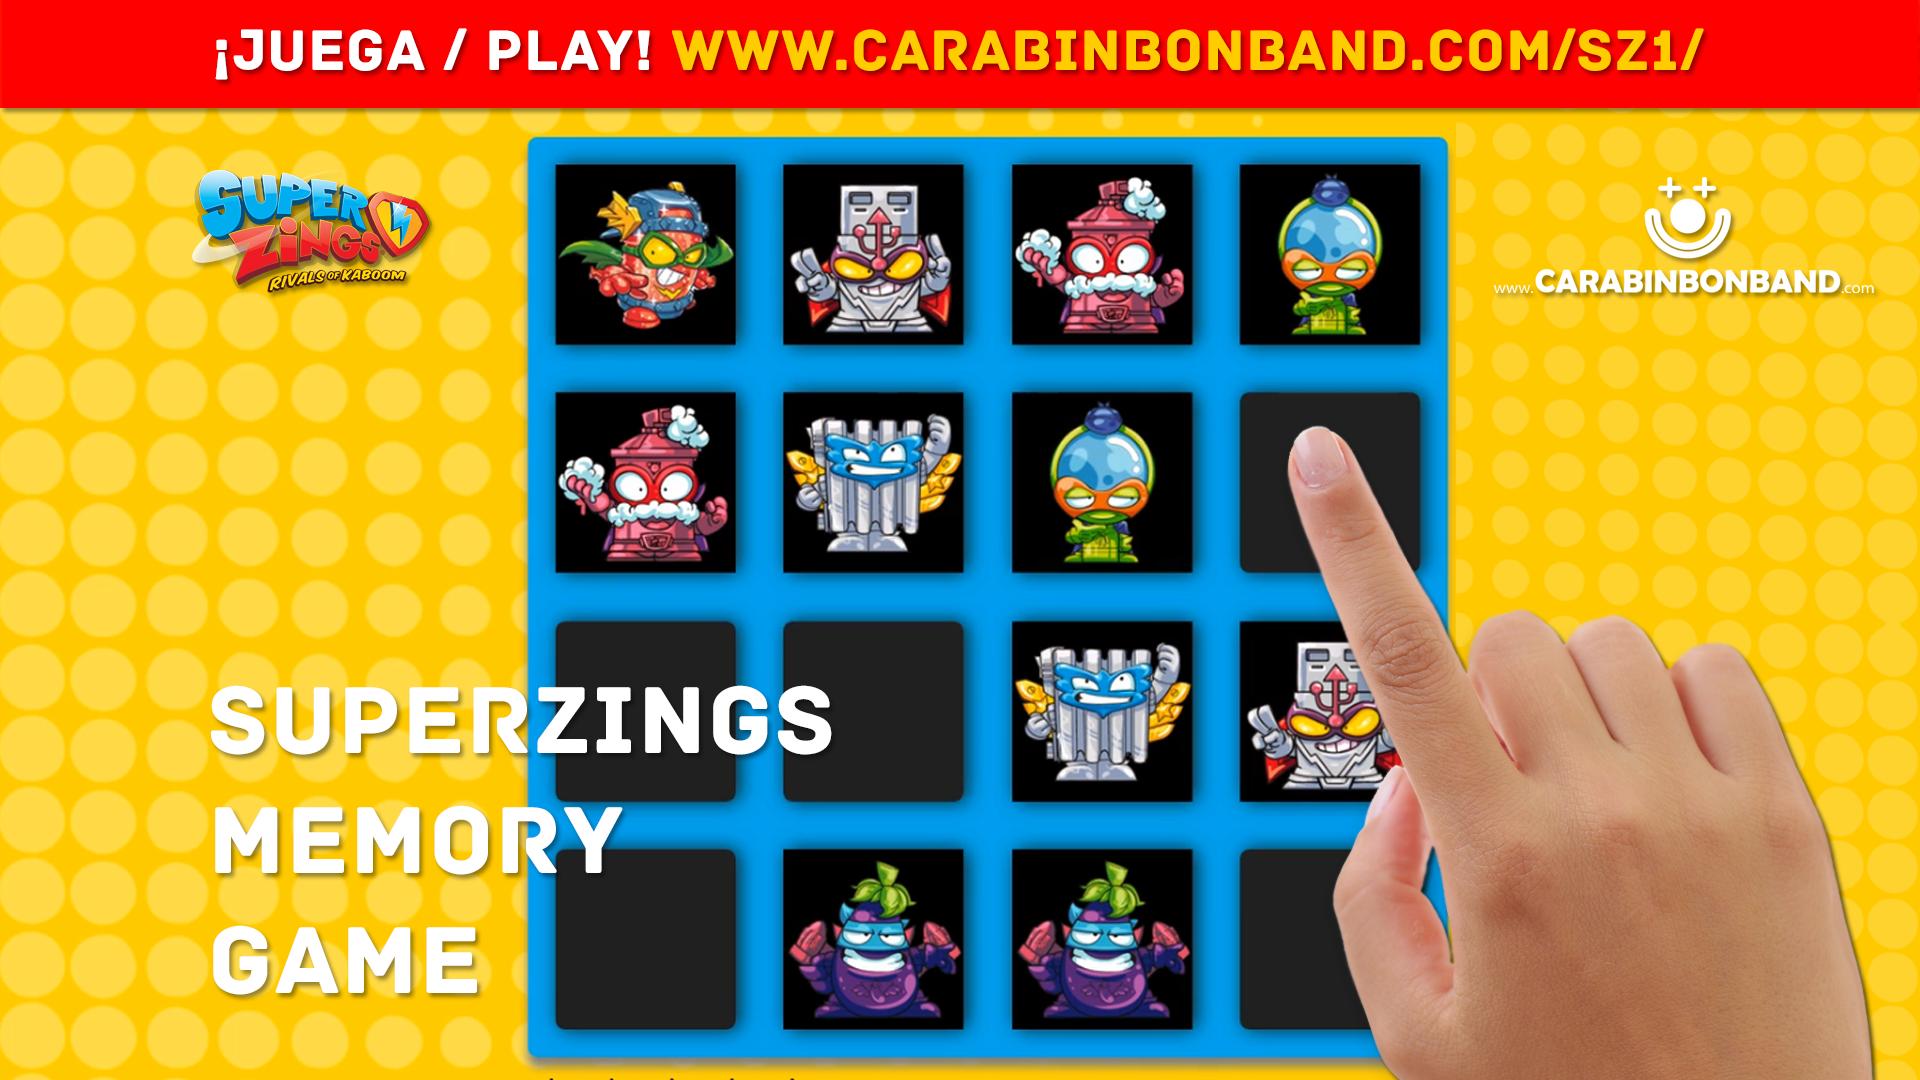 SUPERZINGS MEMORY GAME - ¿Podrás encontrar los personajes iguales?